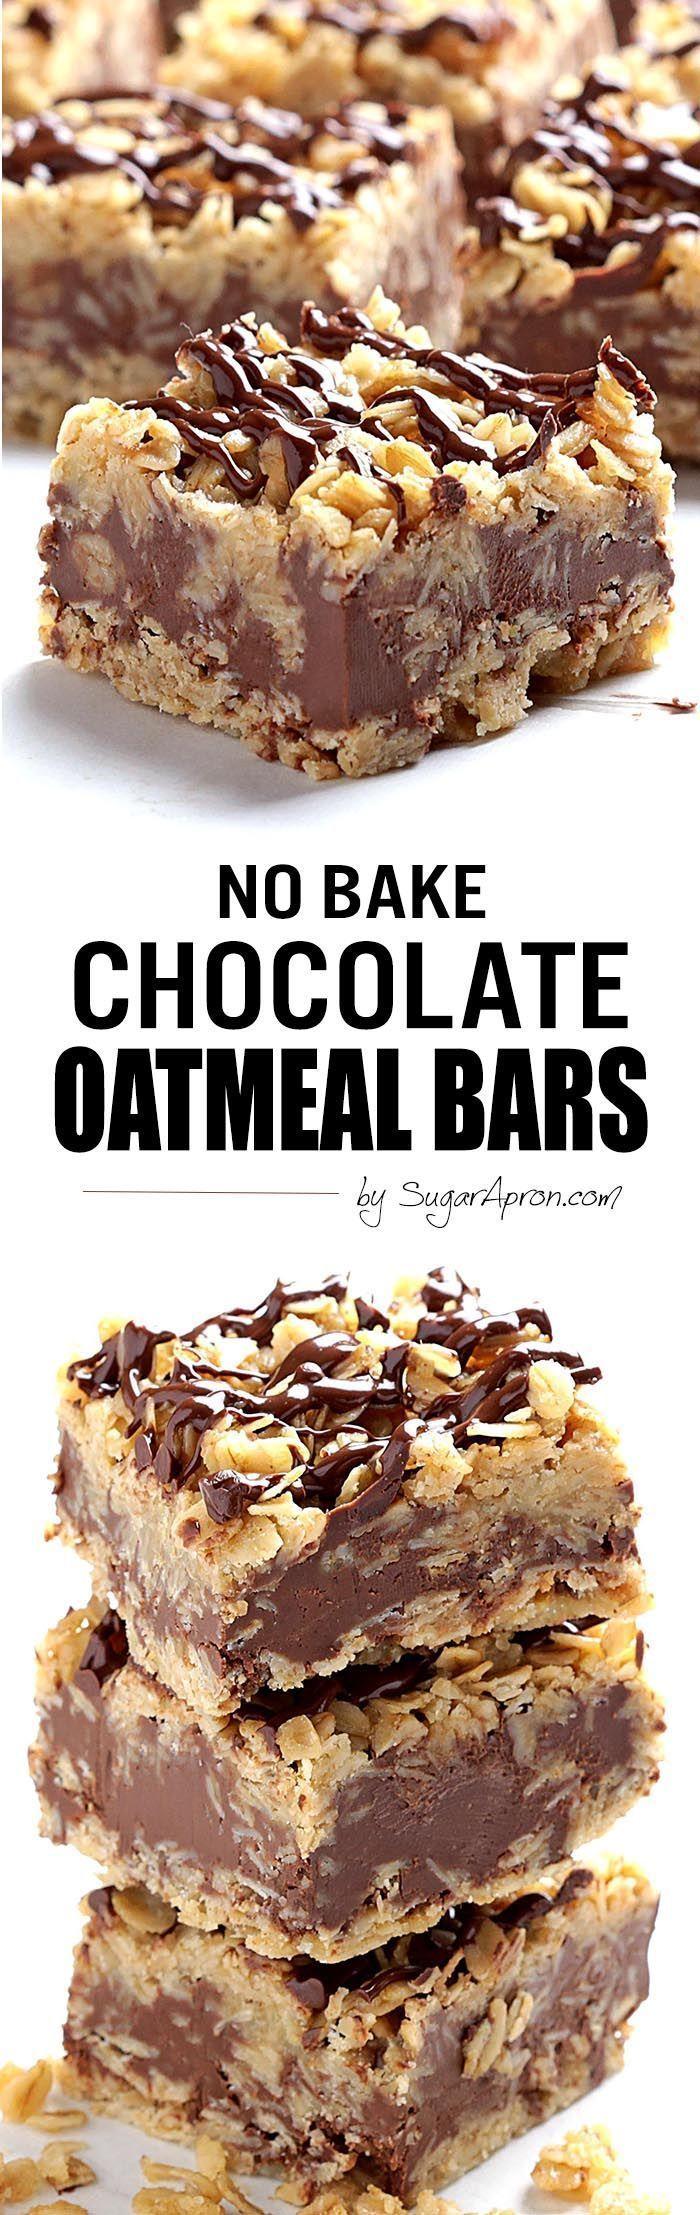 No Bake Chocolate Oatmeal Bars – Sugar Apron